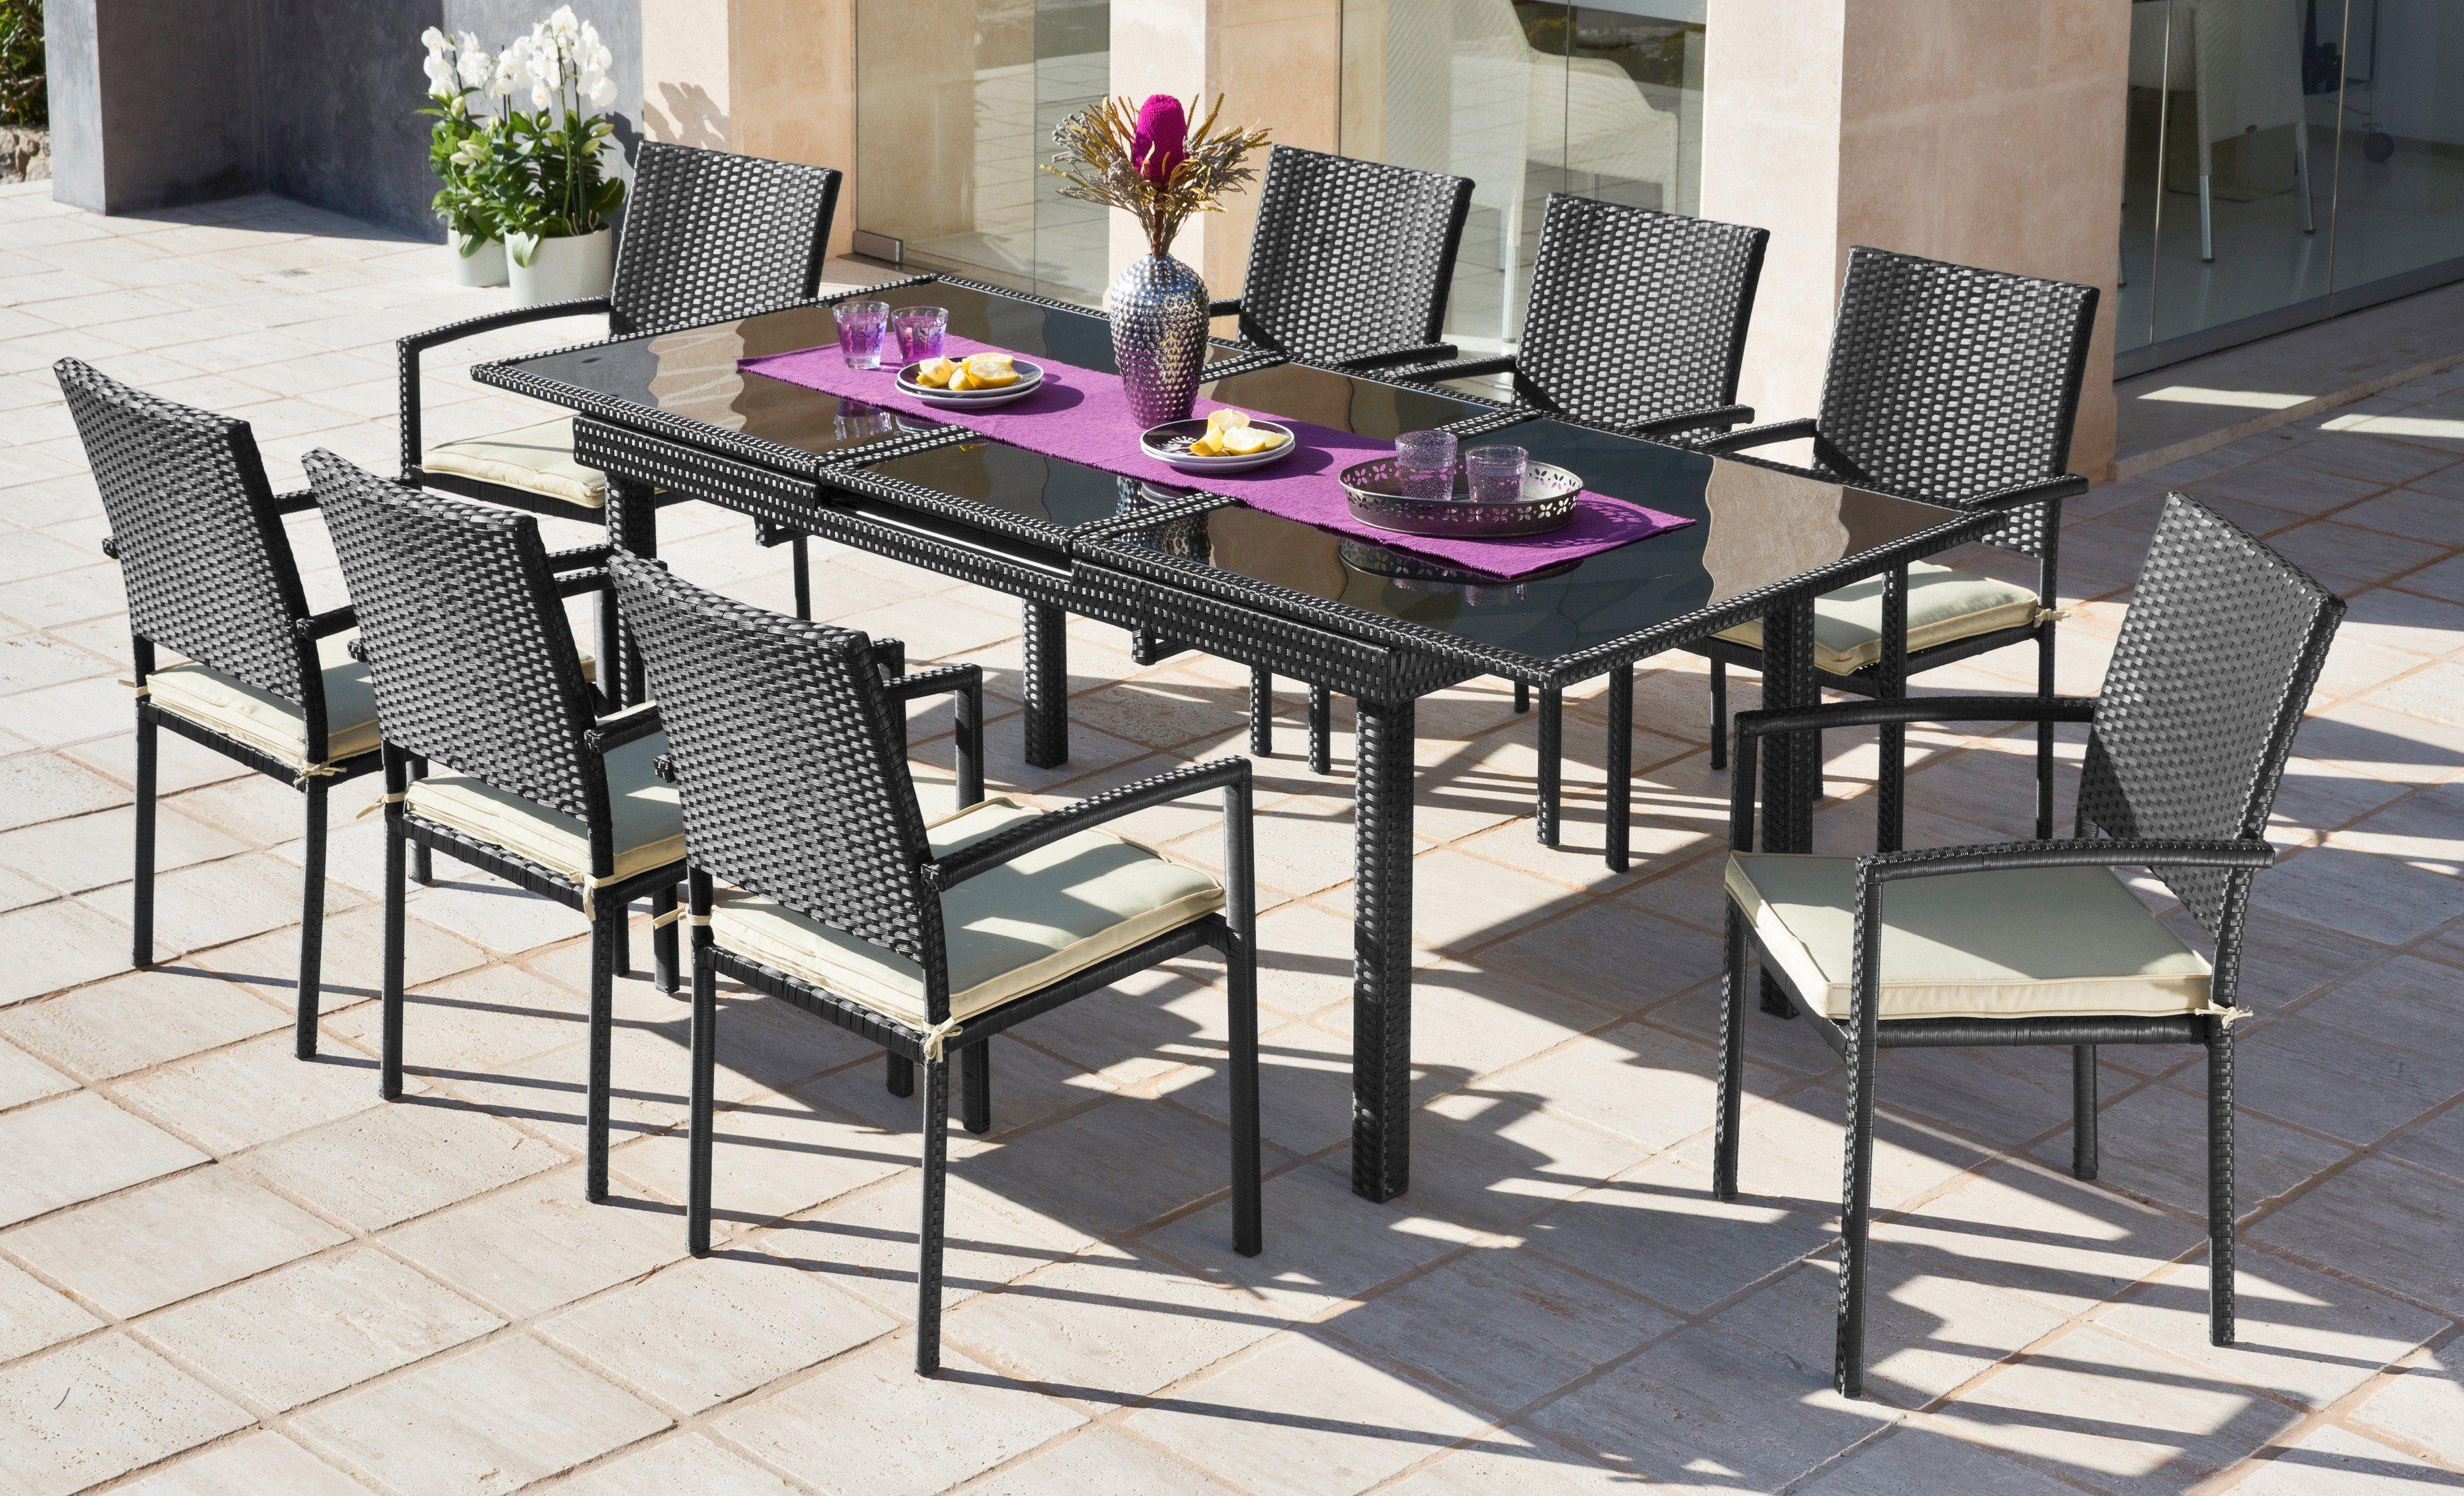 17-tgl. Gartenmöbelset »Alanya«, 8 Sessel, Tisch 160-210cm, Polyratten, schwarz